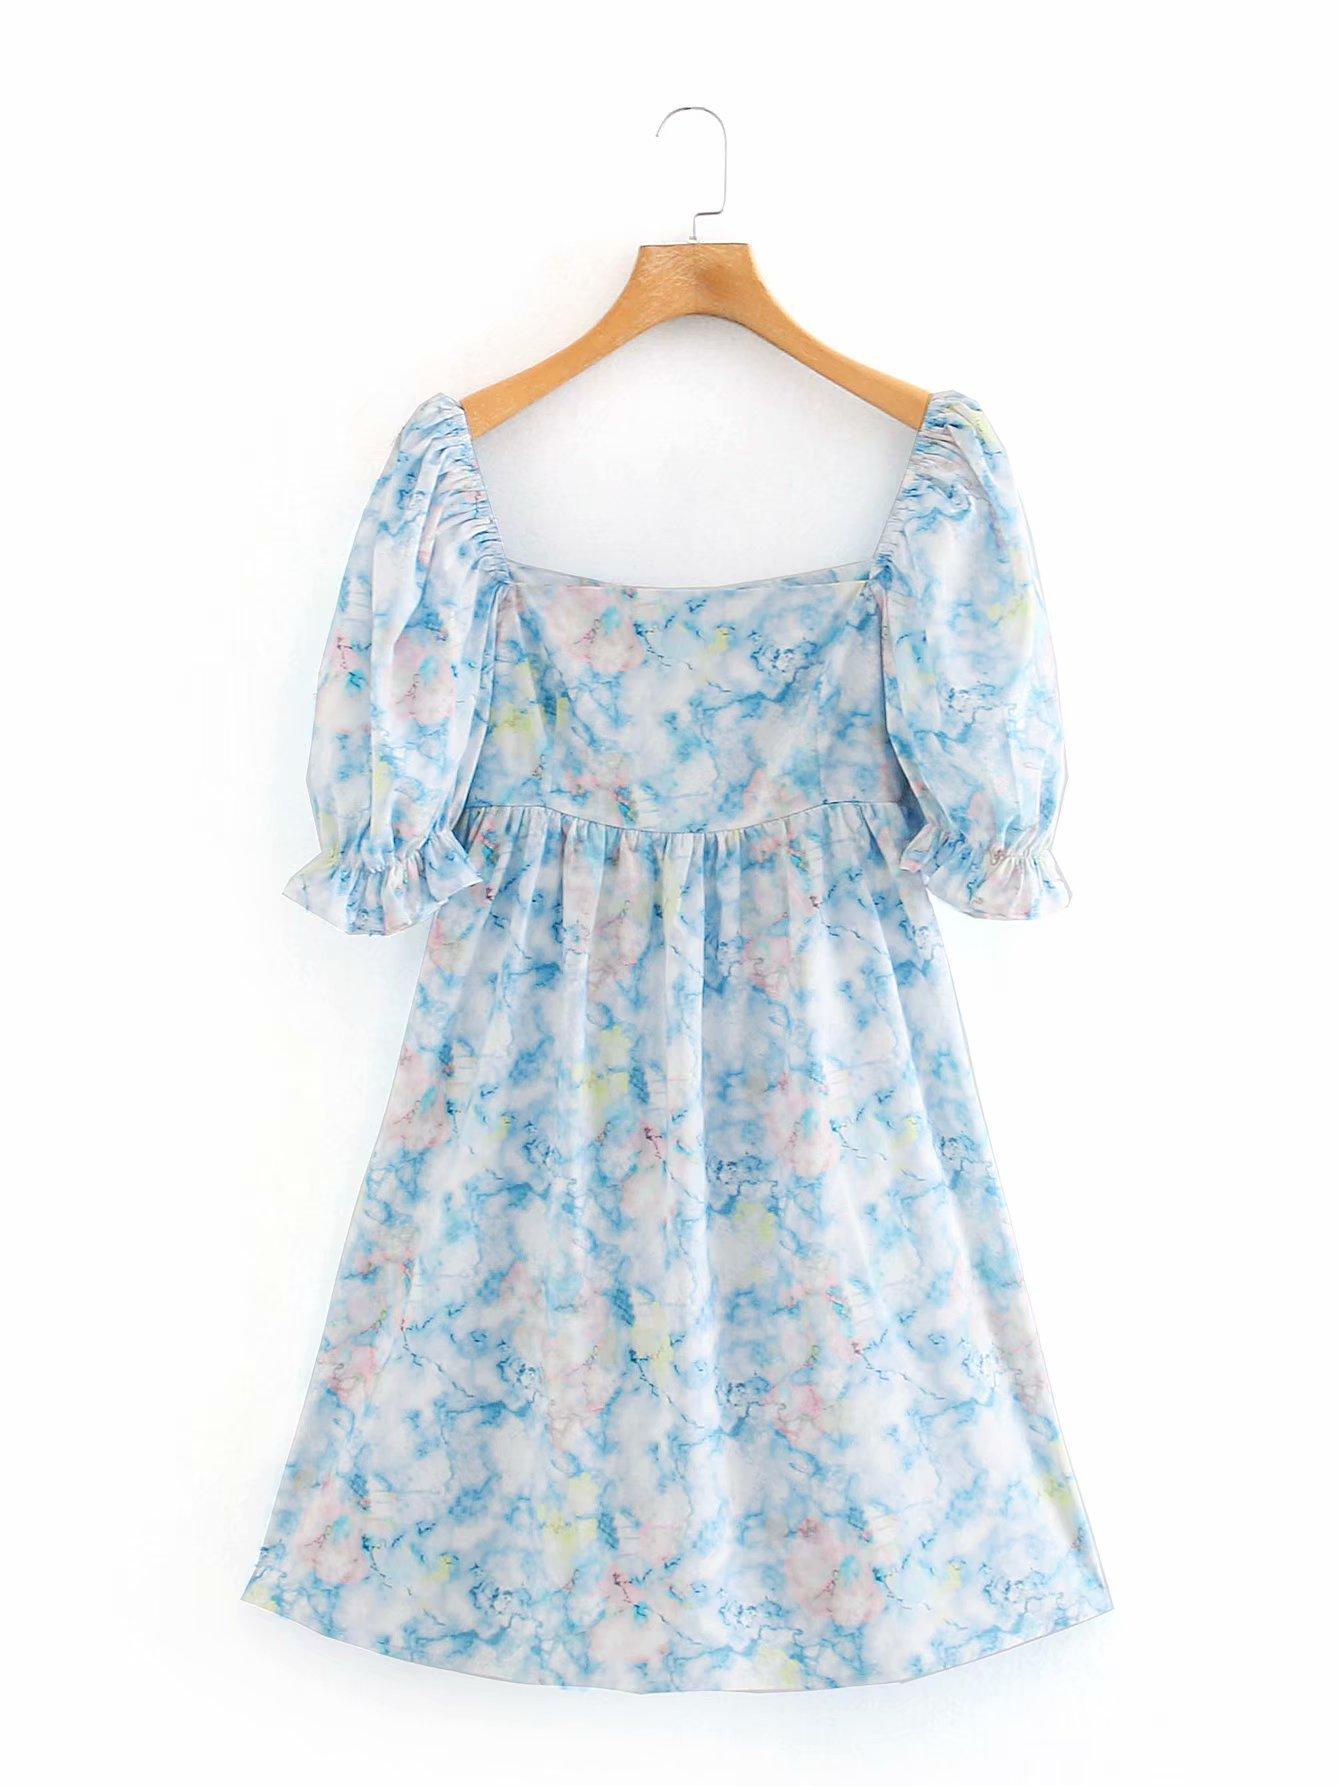 2020 Spring Summer New Retro Print Recipients Puff Sleeve zaraing women Dress vadiming sheining female dress sexy sweet XDN9567